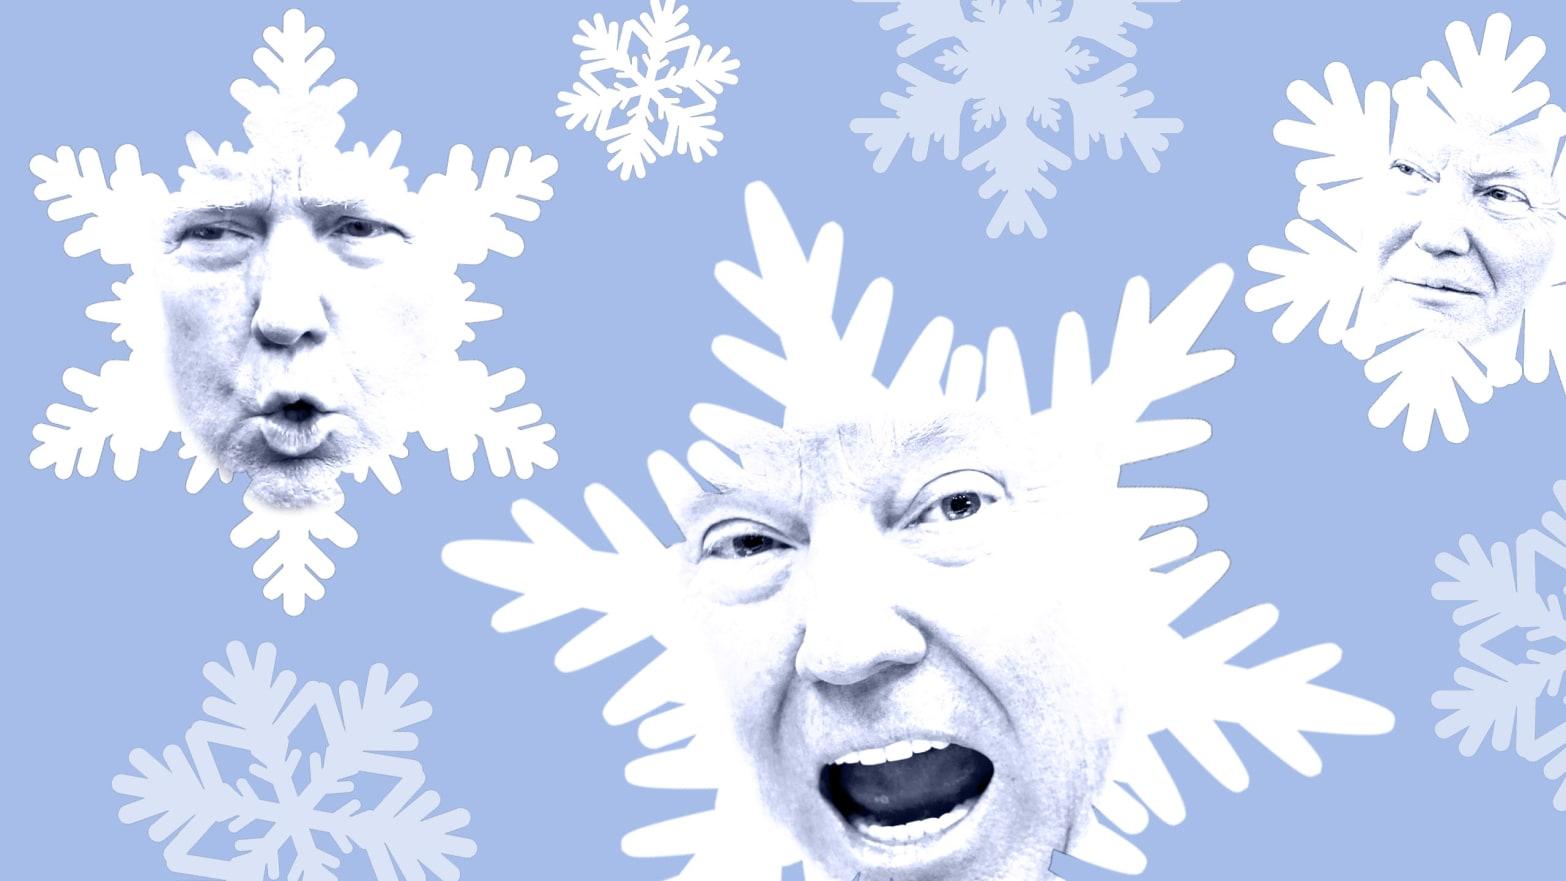 president snowflake trump needs